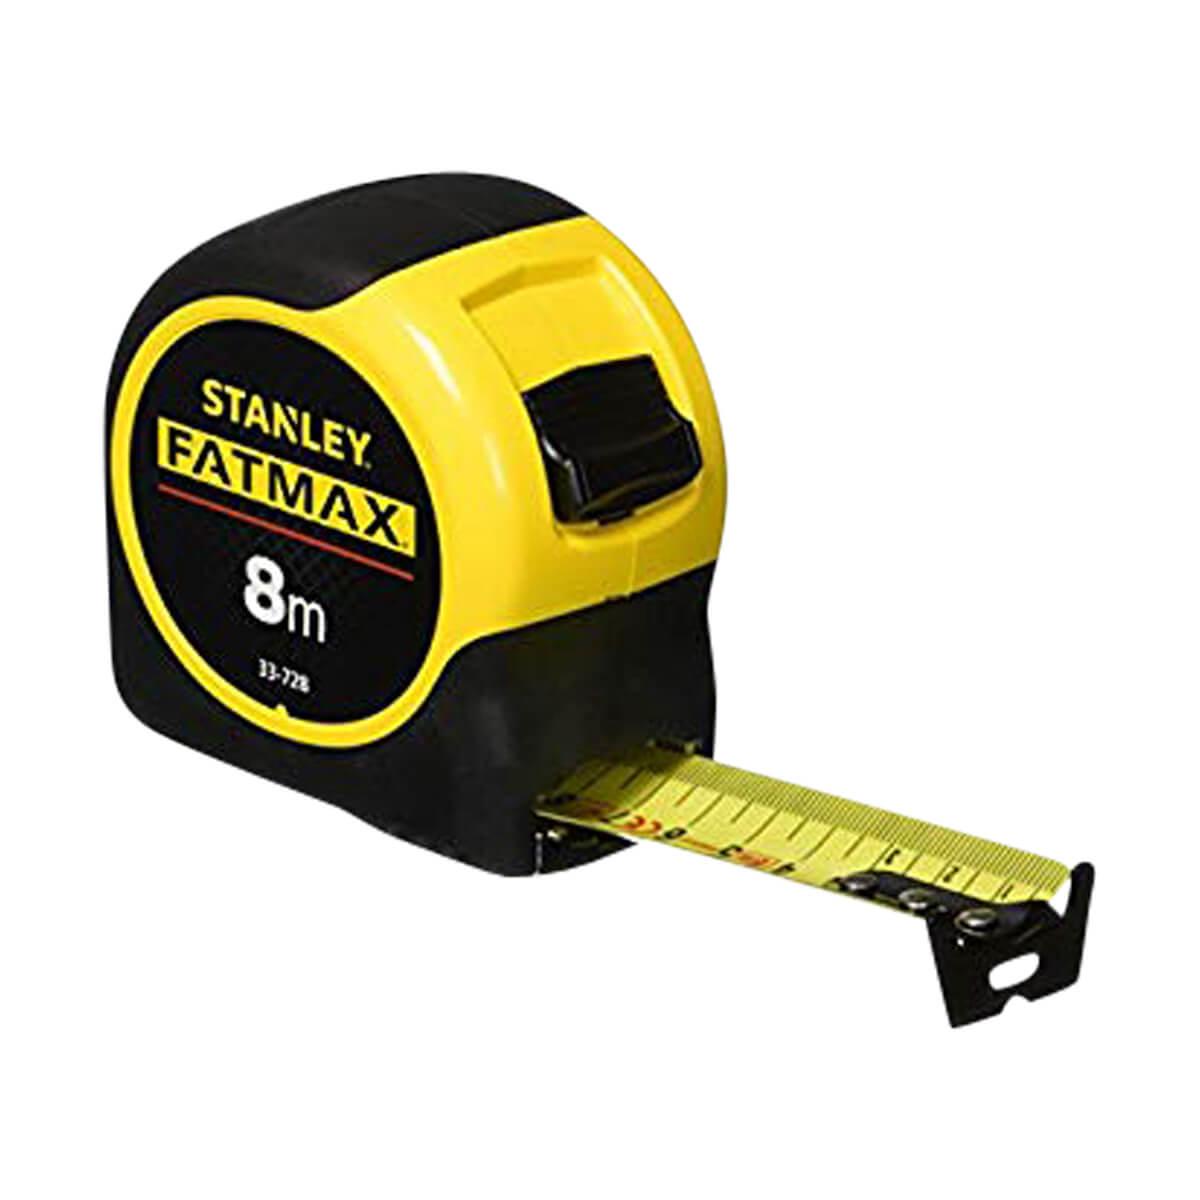 "Stanley 8m/26' x 1-1/4"" FatMax Metric/Fractional Tape Rule"